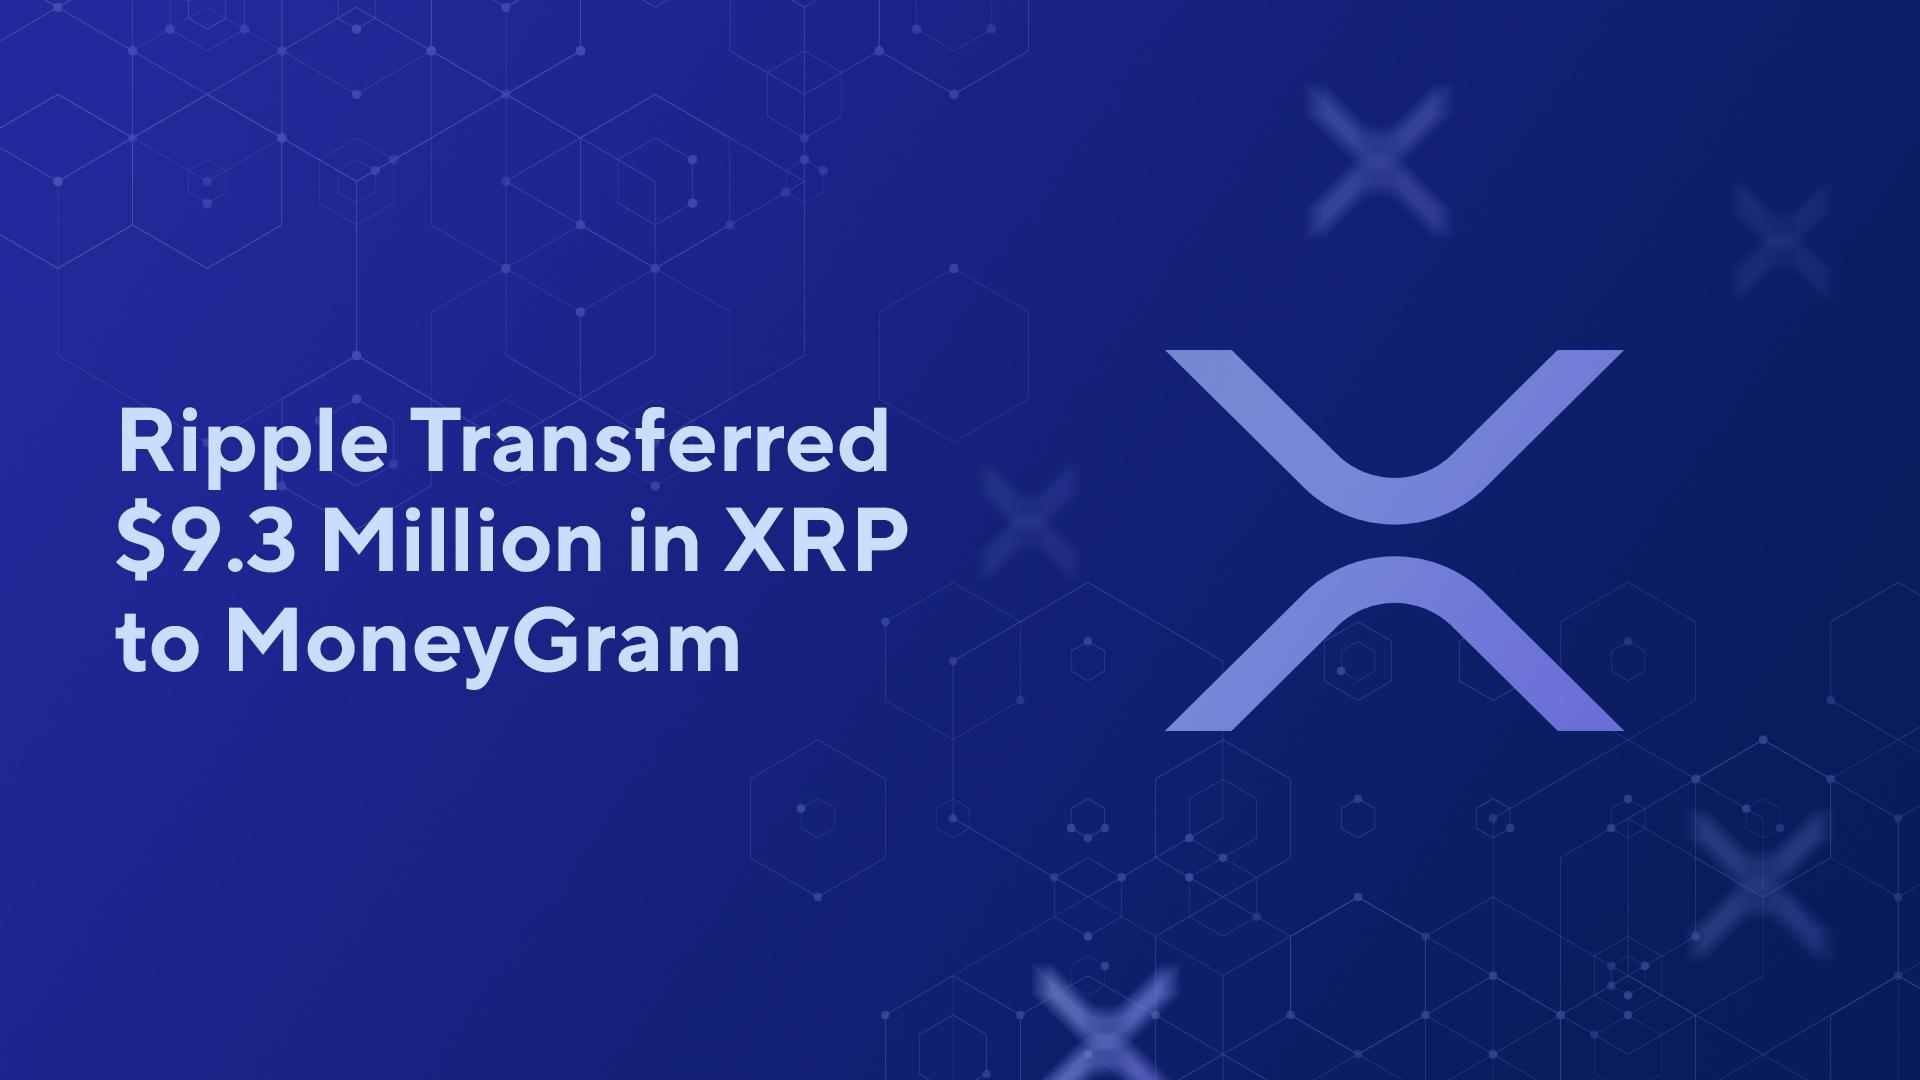 Ripple Transferred $9.3 Million in XRP to MoneyGram